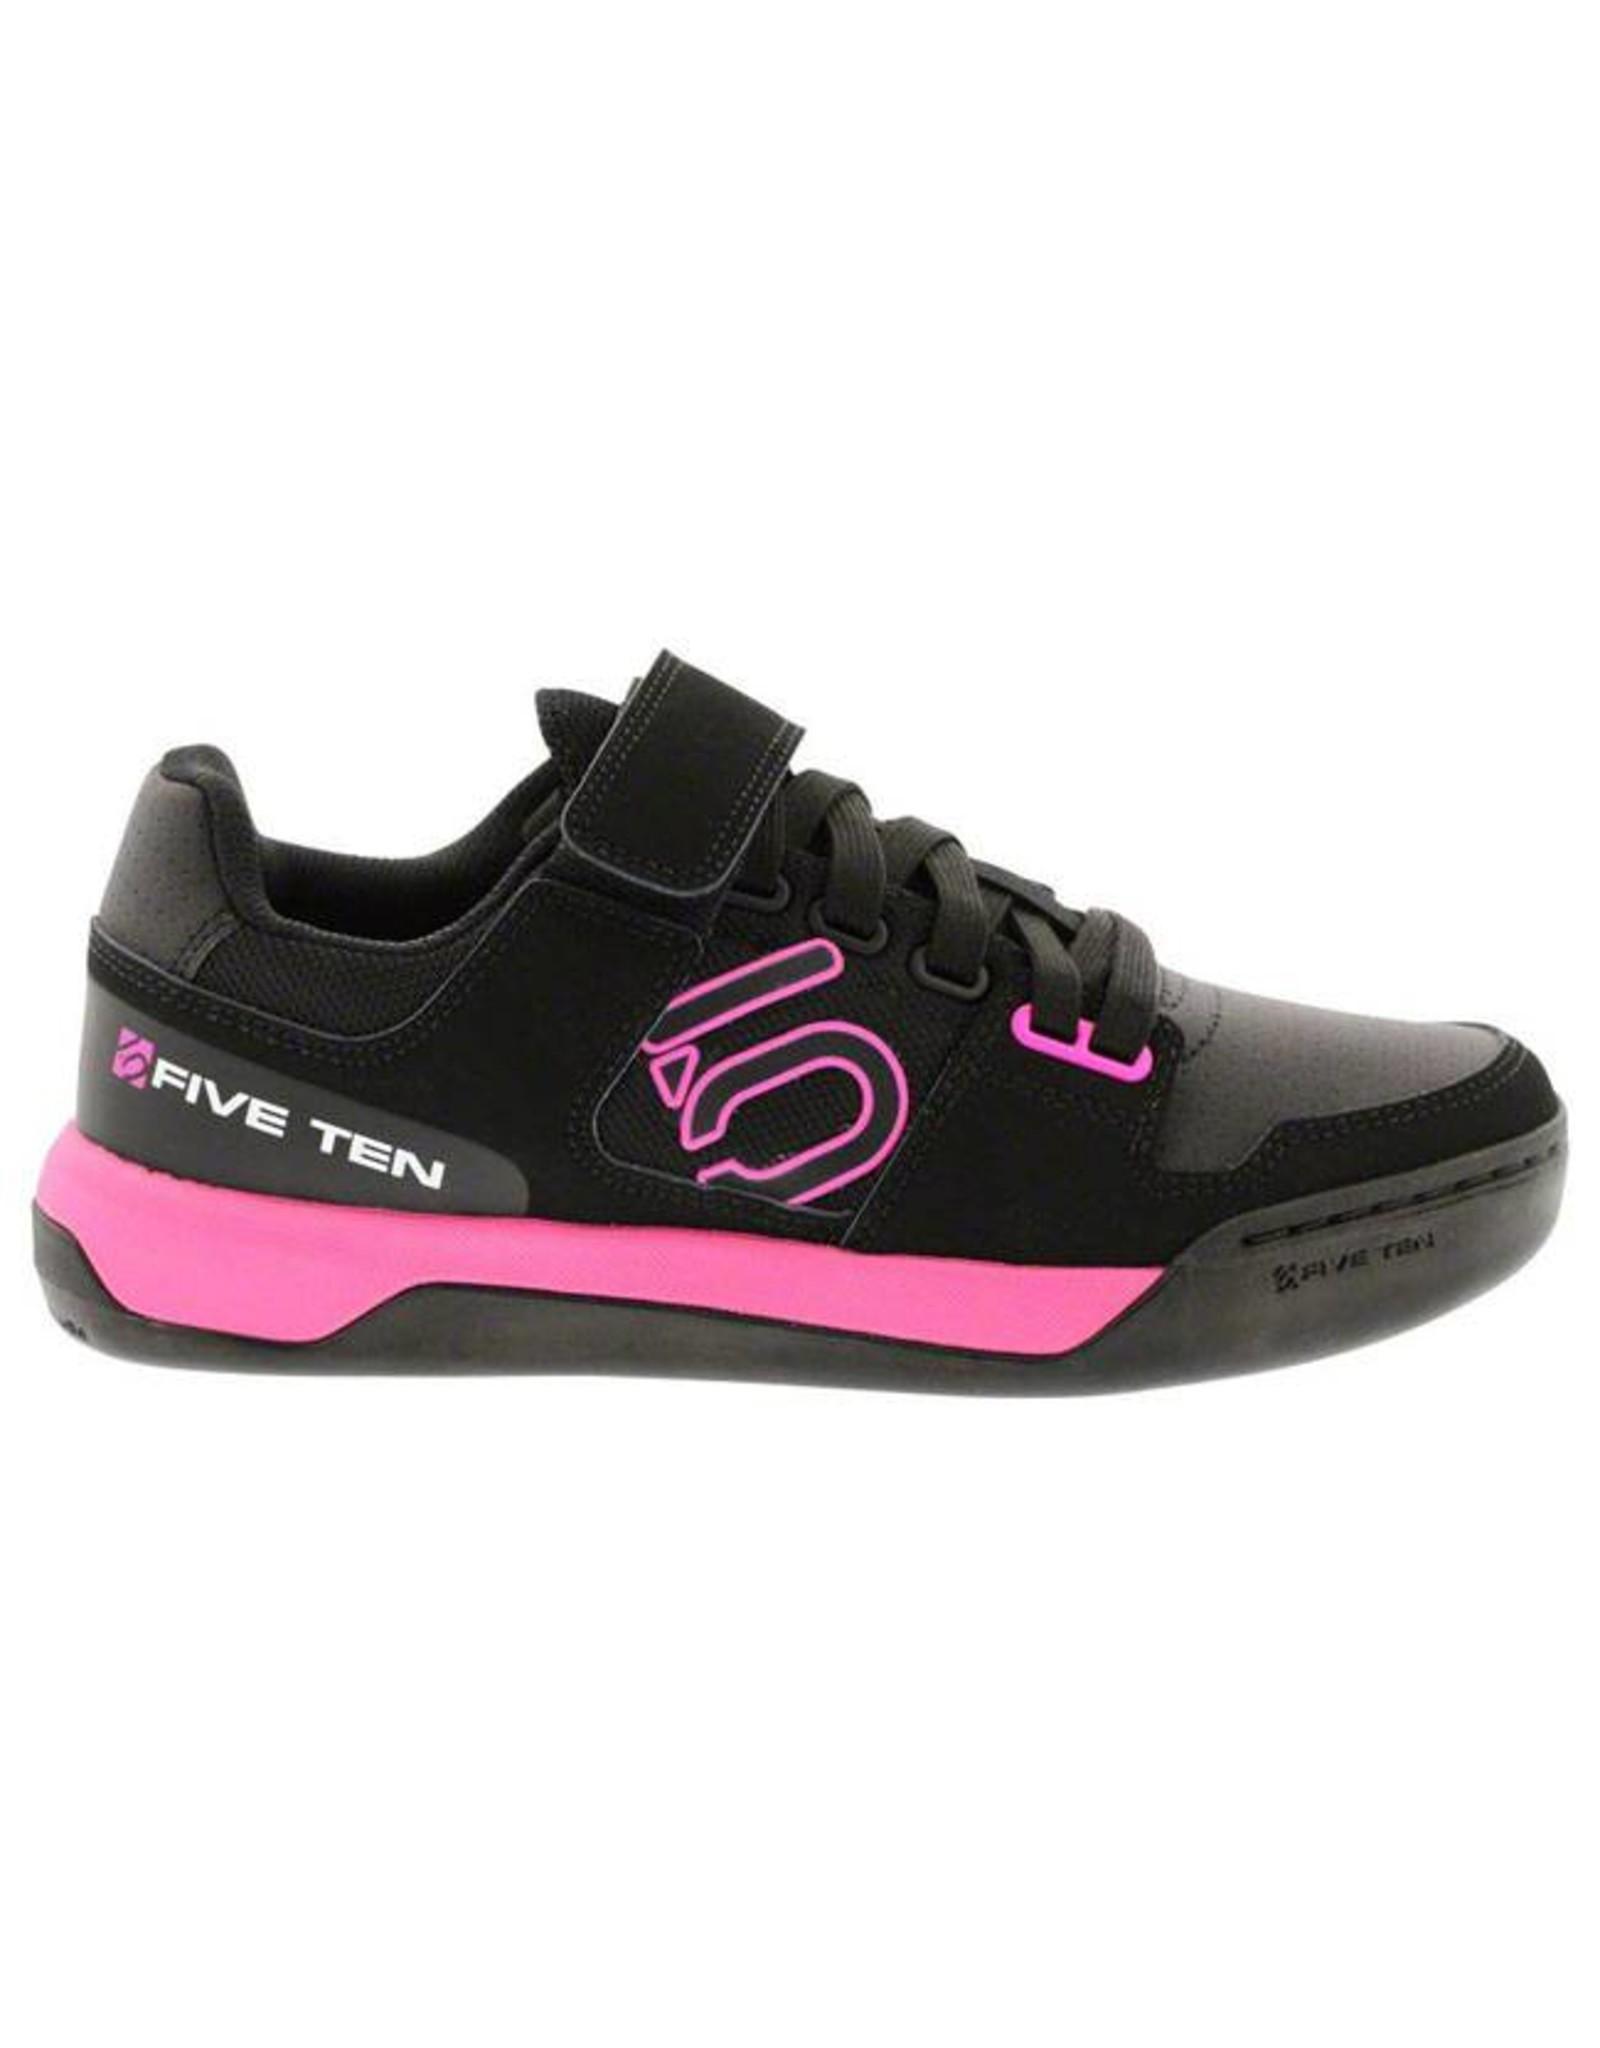 Five Ten Five Ten Hellcat Women's Clipless/Flat Pedal Shoe: Shock Pink 10.5